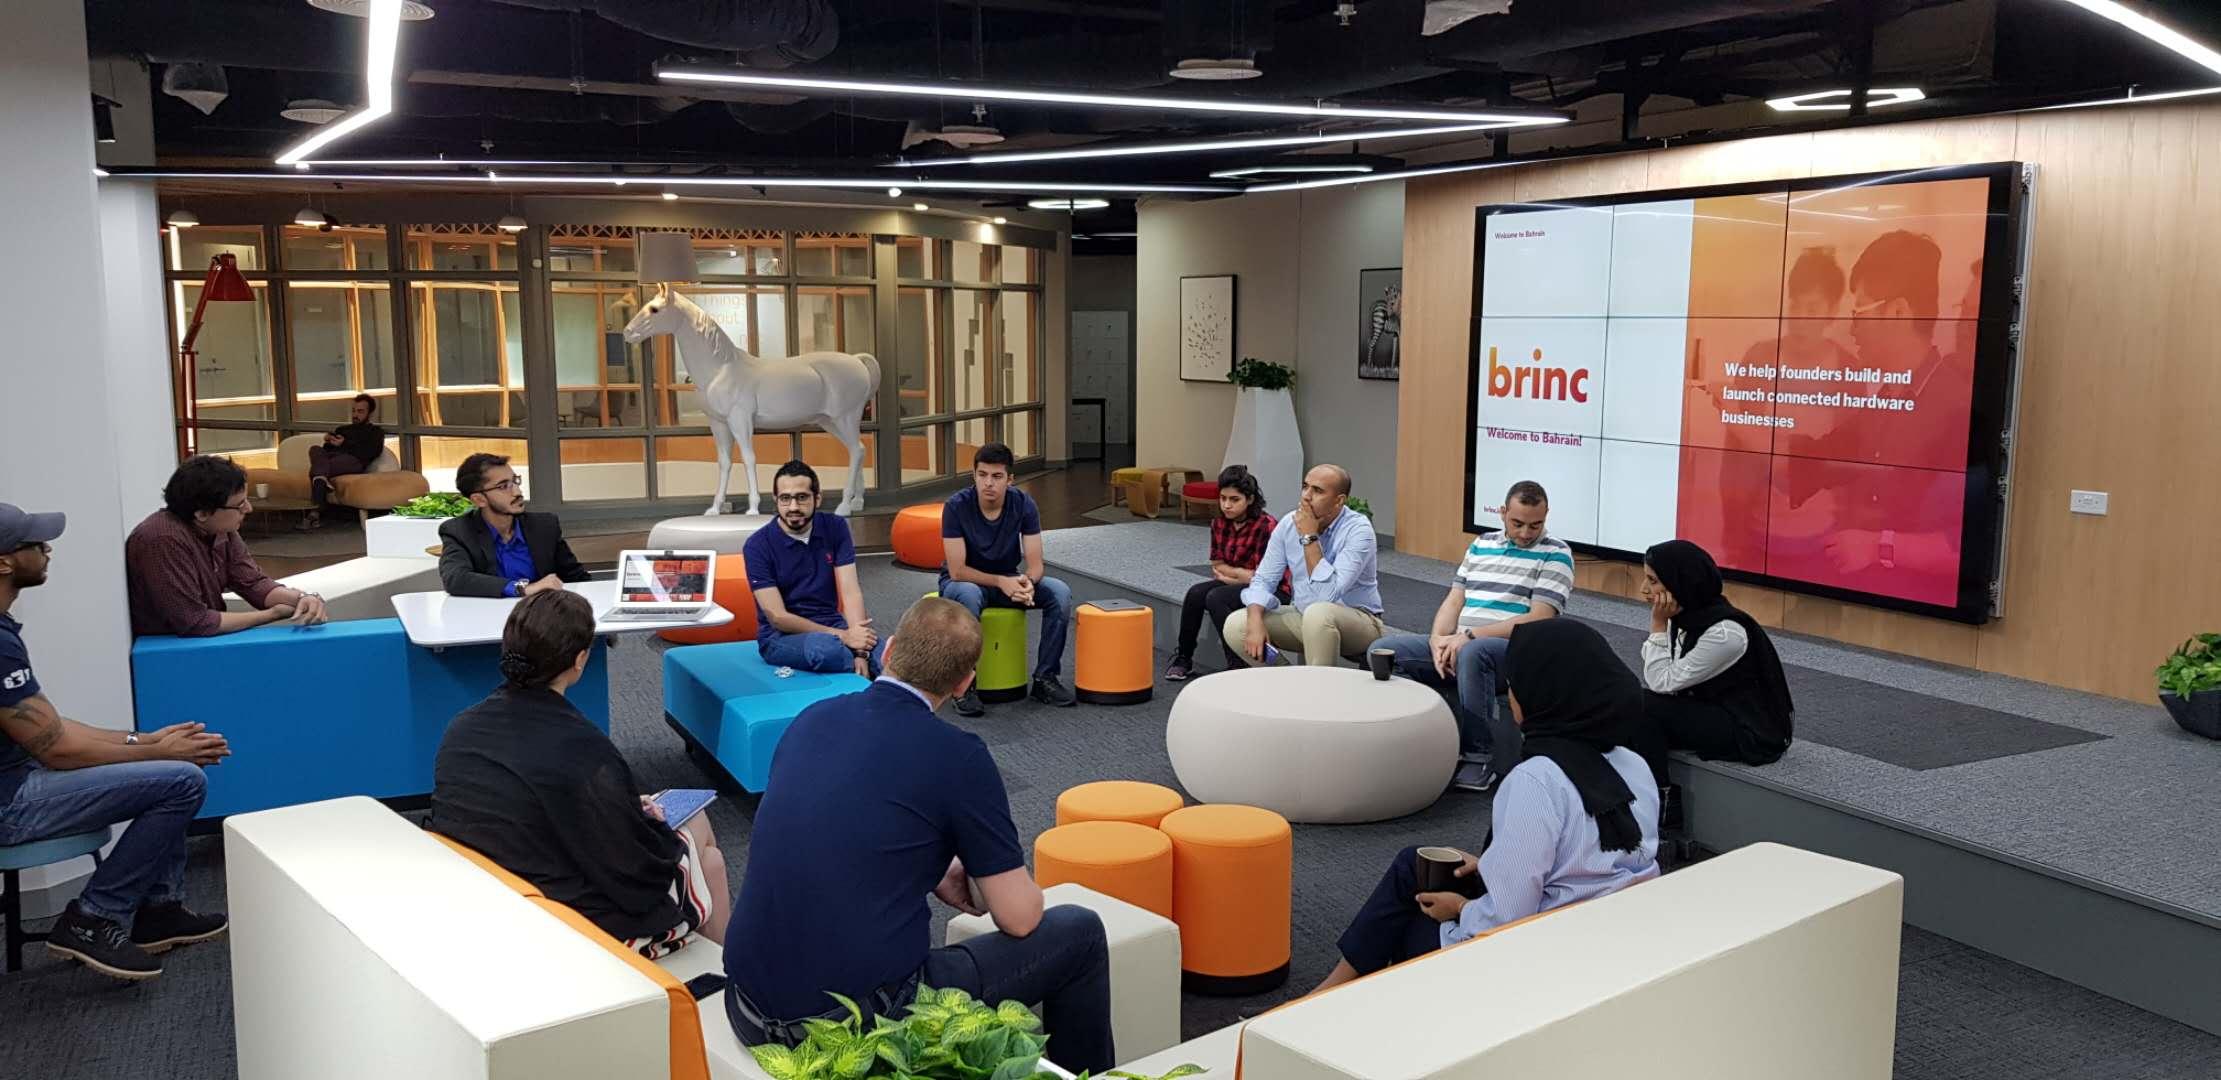 Brinc Batelco IoT Hub, Manama